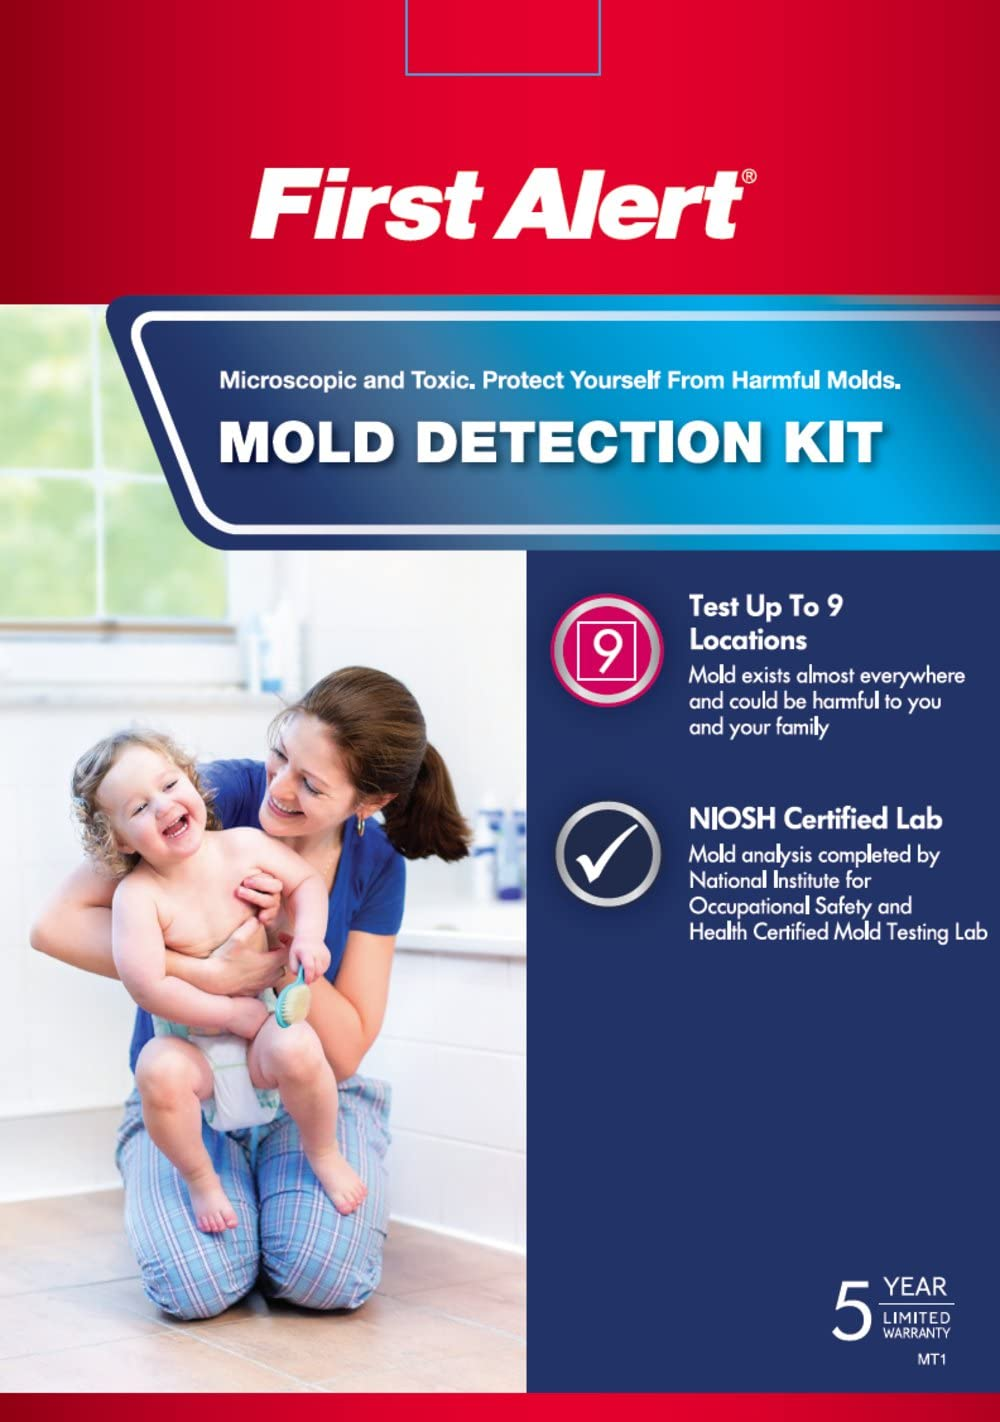 First Alert MT1 Mold Detection Kit - Mold Test Kit -